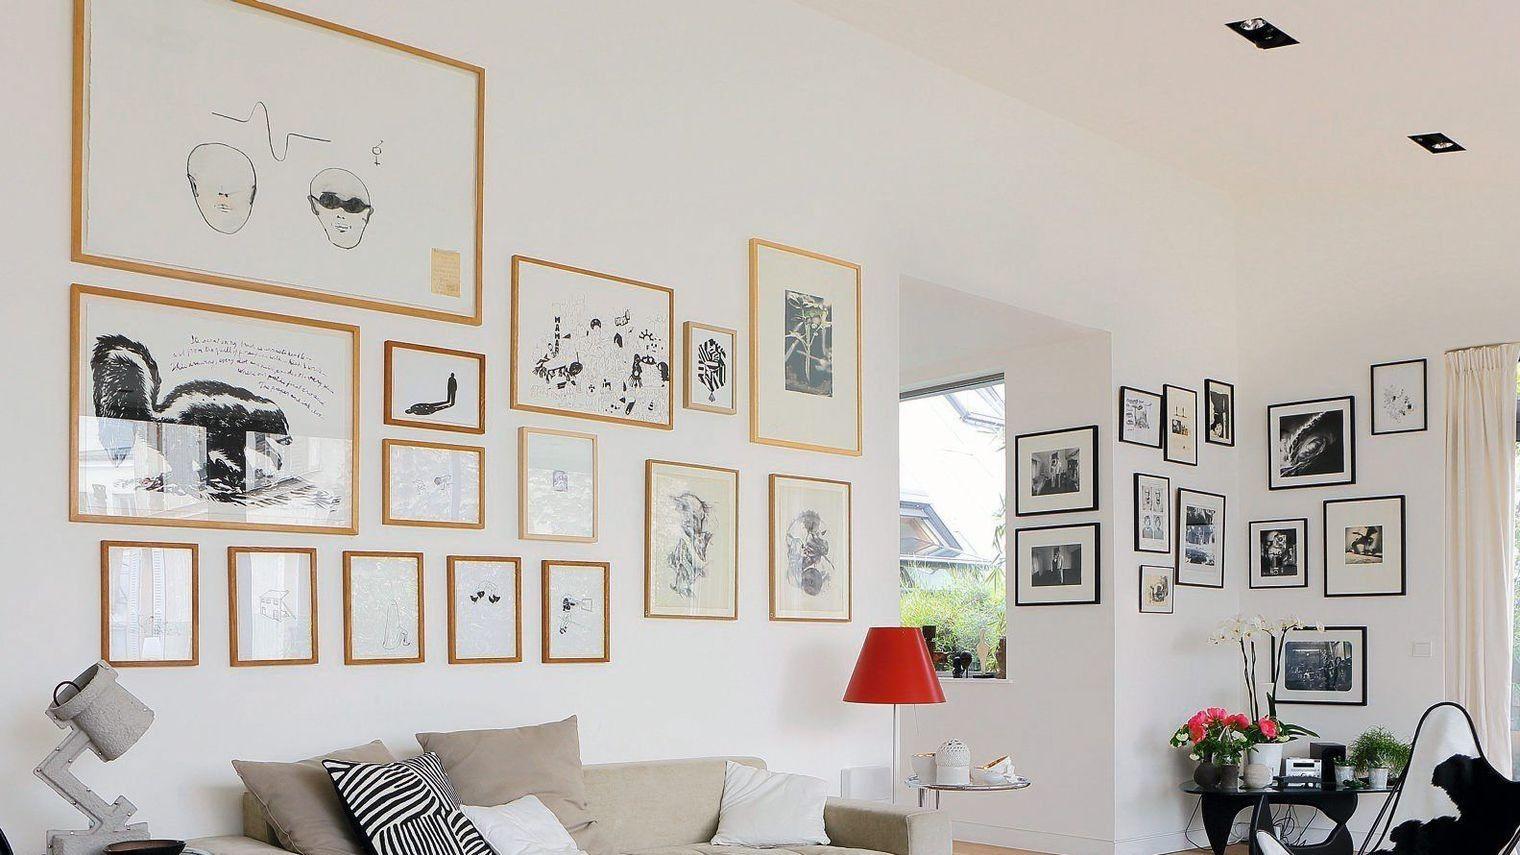 Pin by 505 on Deco | Idee deco mur salon, Idee deco murale, Idee ...